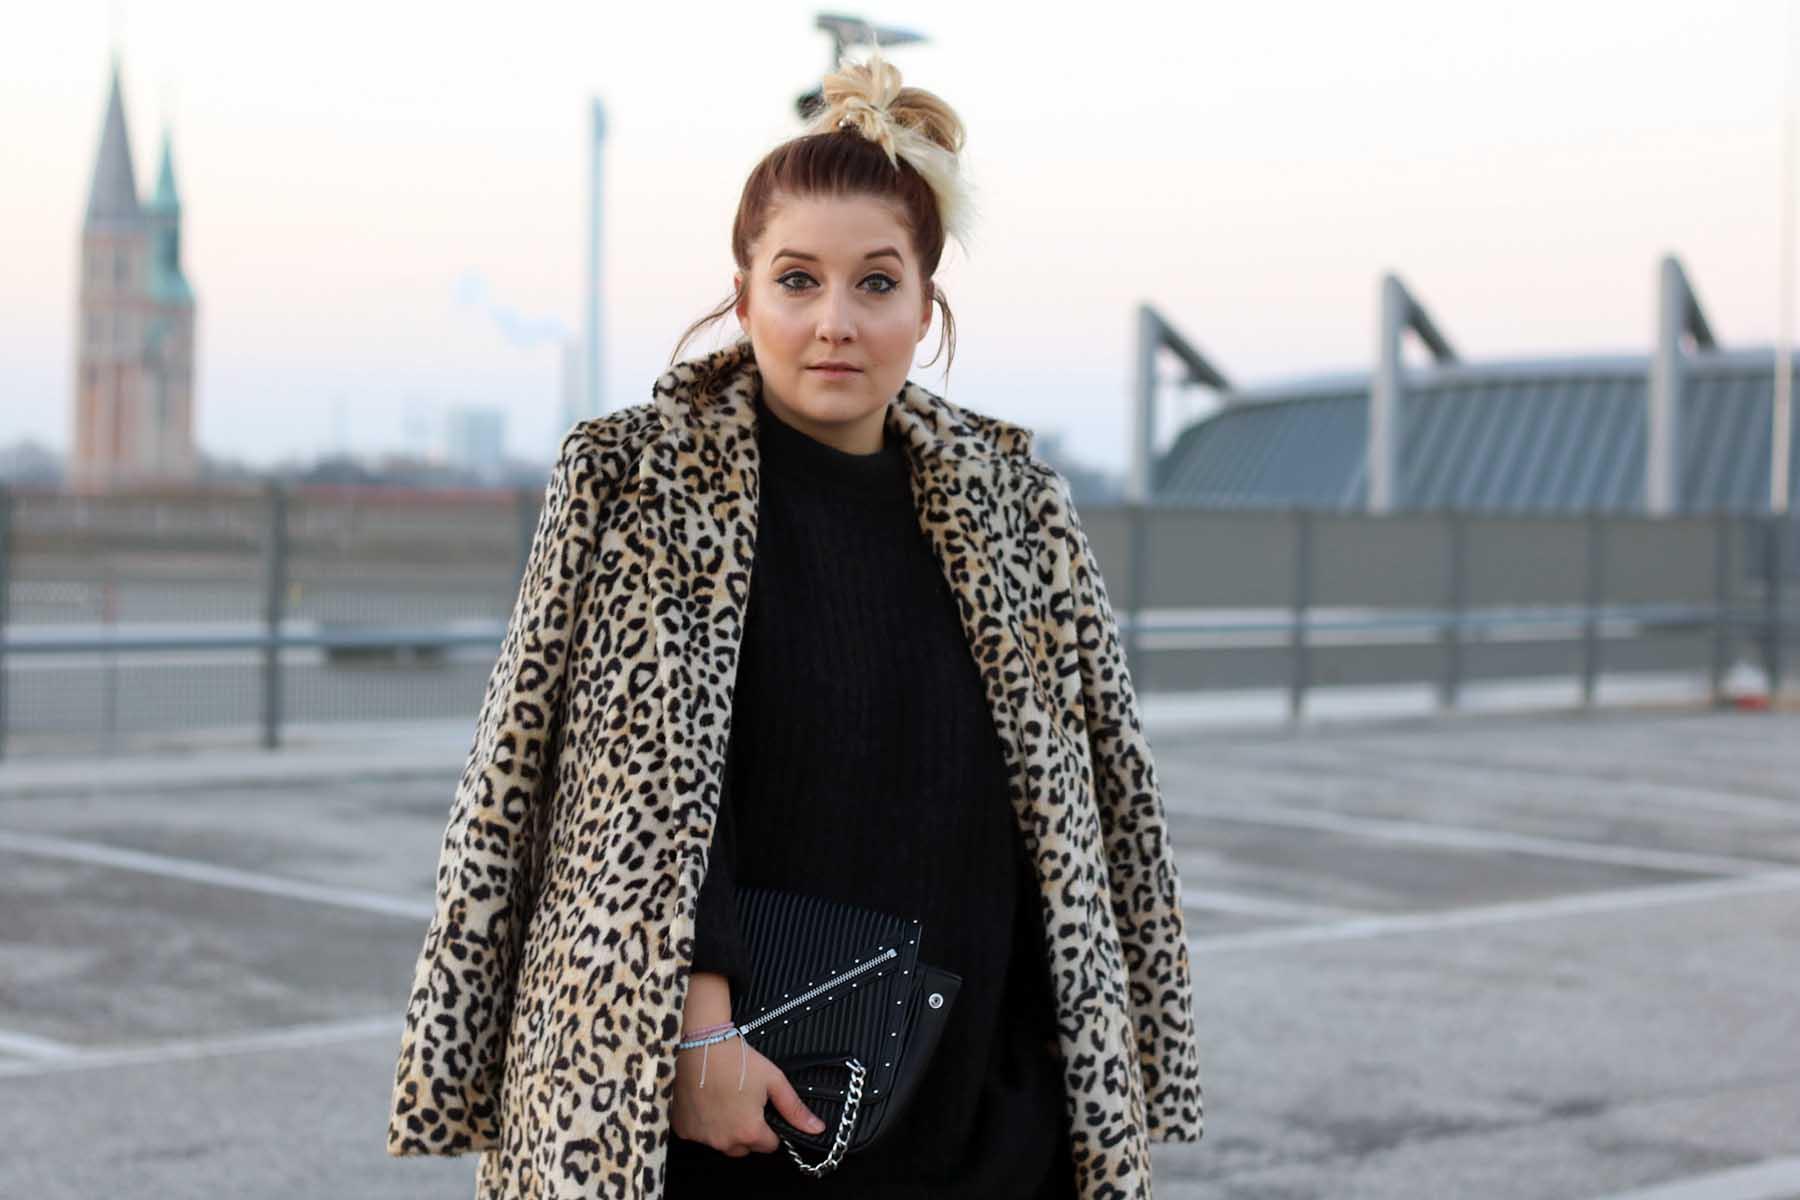 outift-leomantel-mantel-winter-leoparden-modeblog-fashionblog-look-braunschweig23